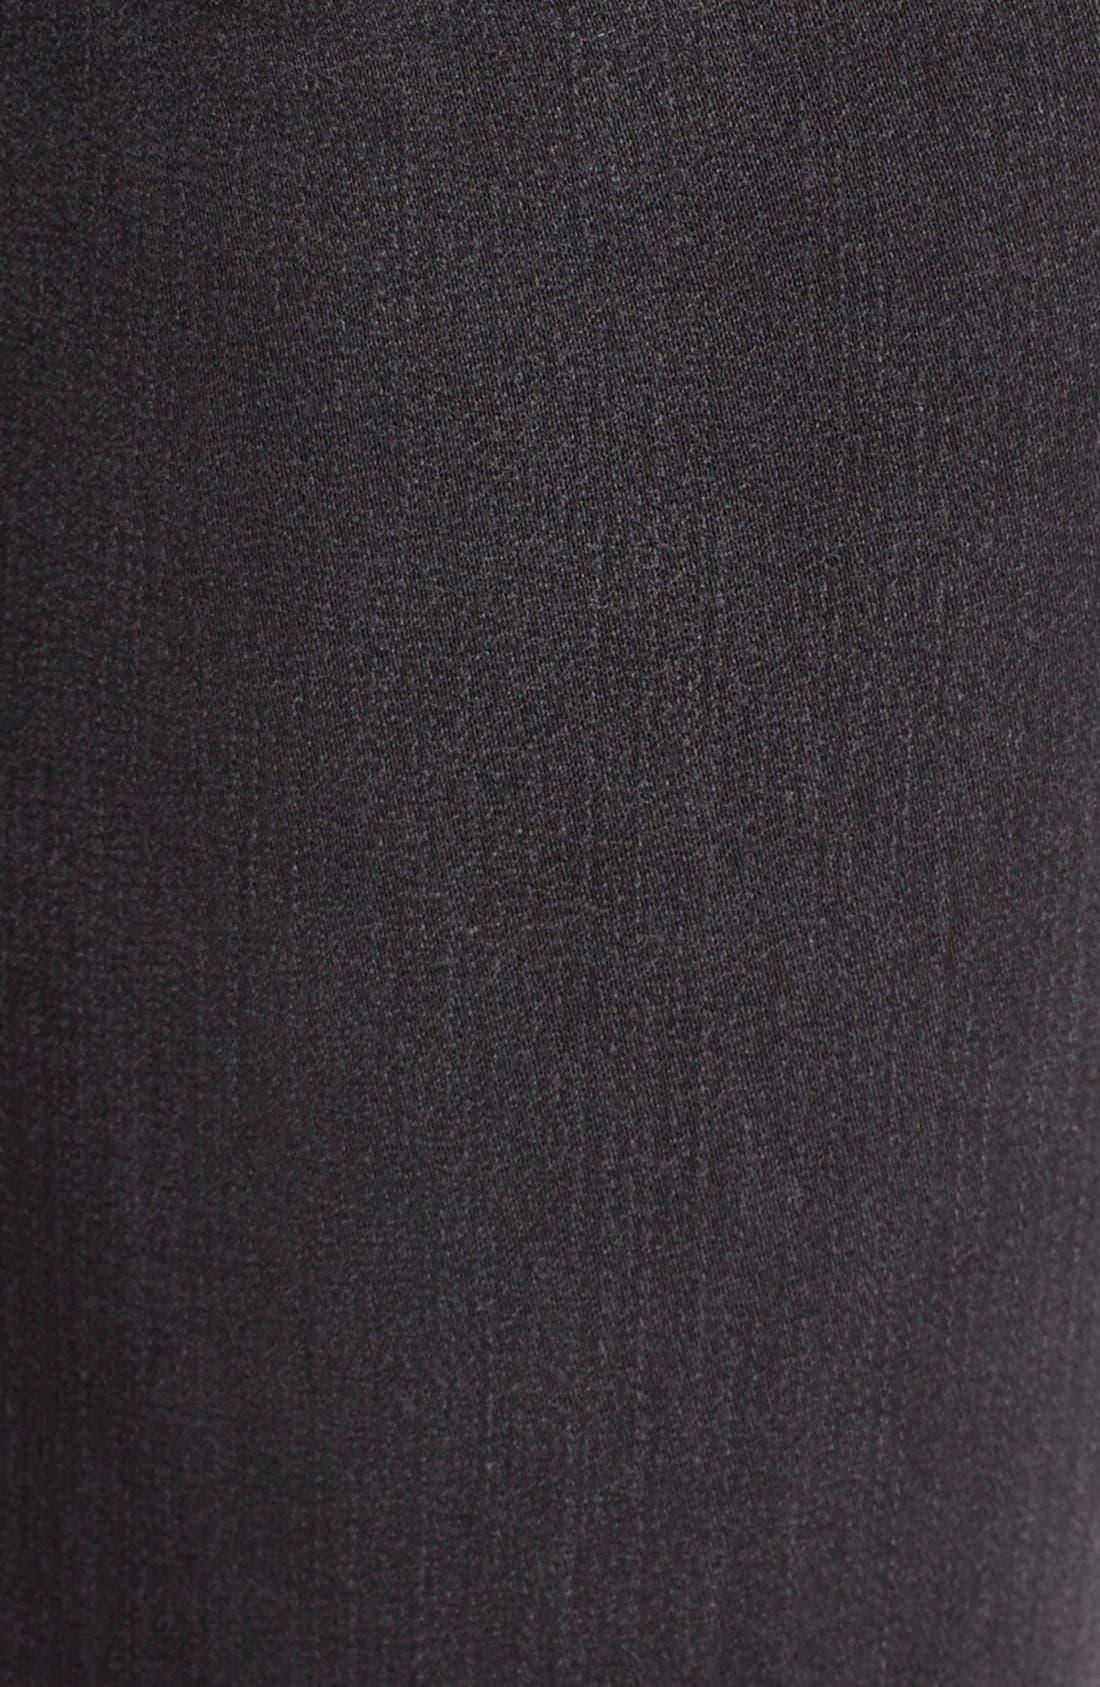 Abby StretchSkinny Jeans,                             Alternate thumbnail 5, color,                             Sulphur